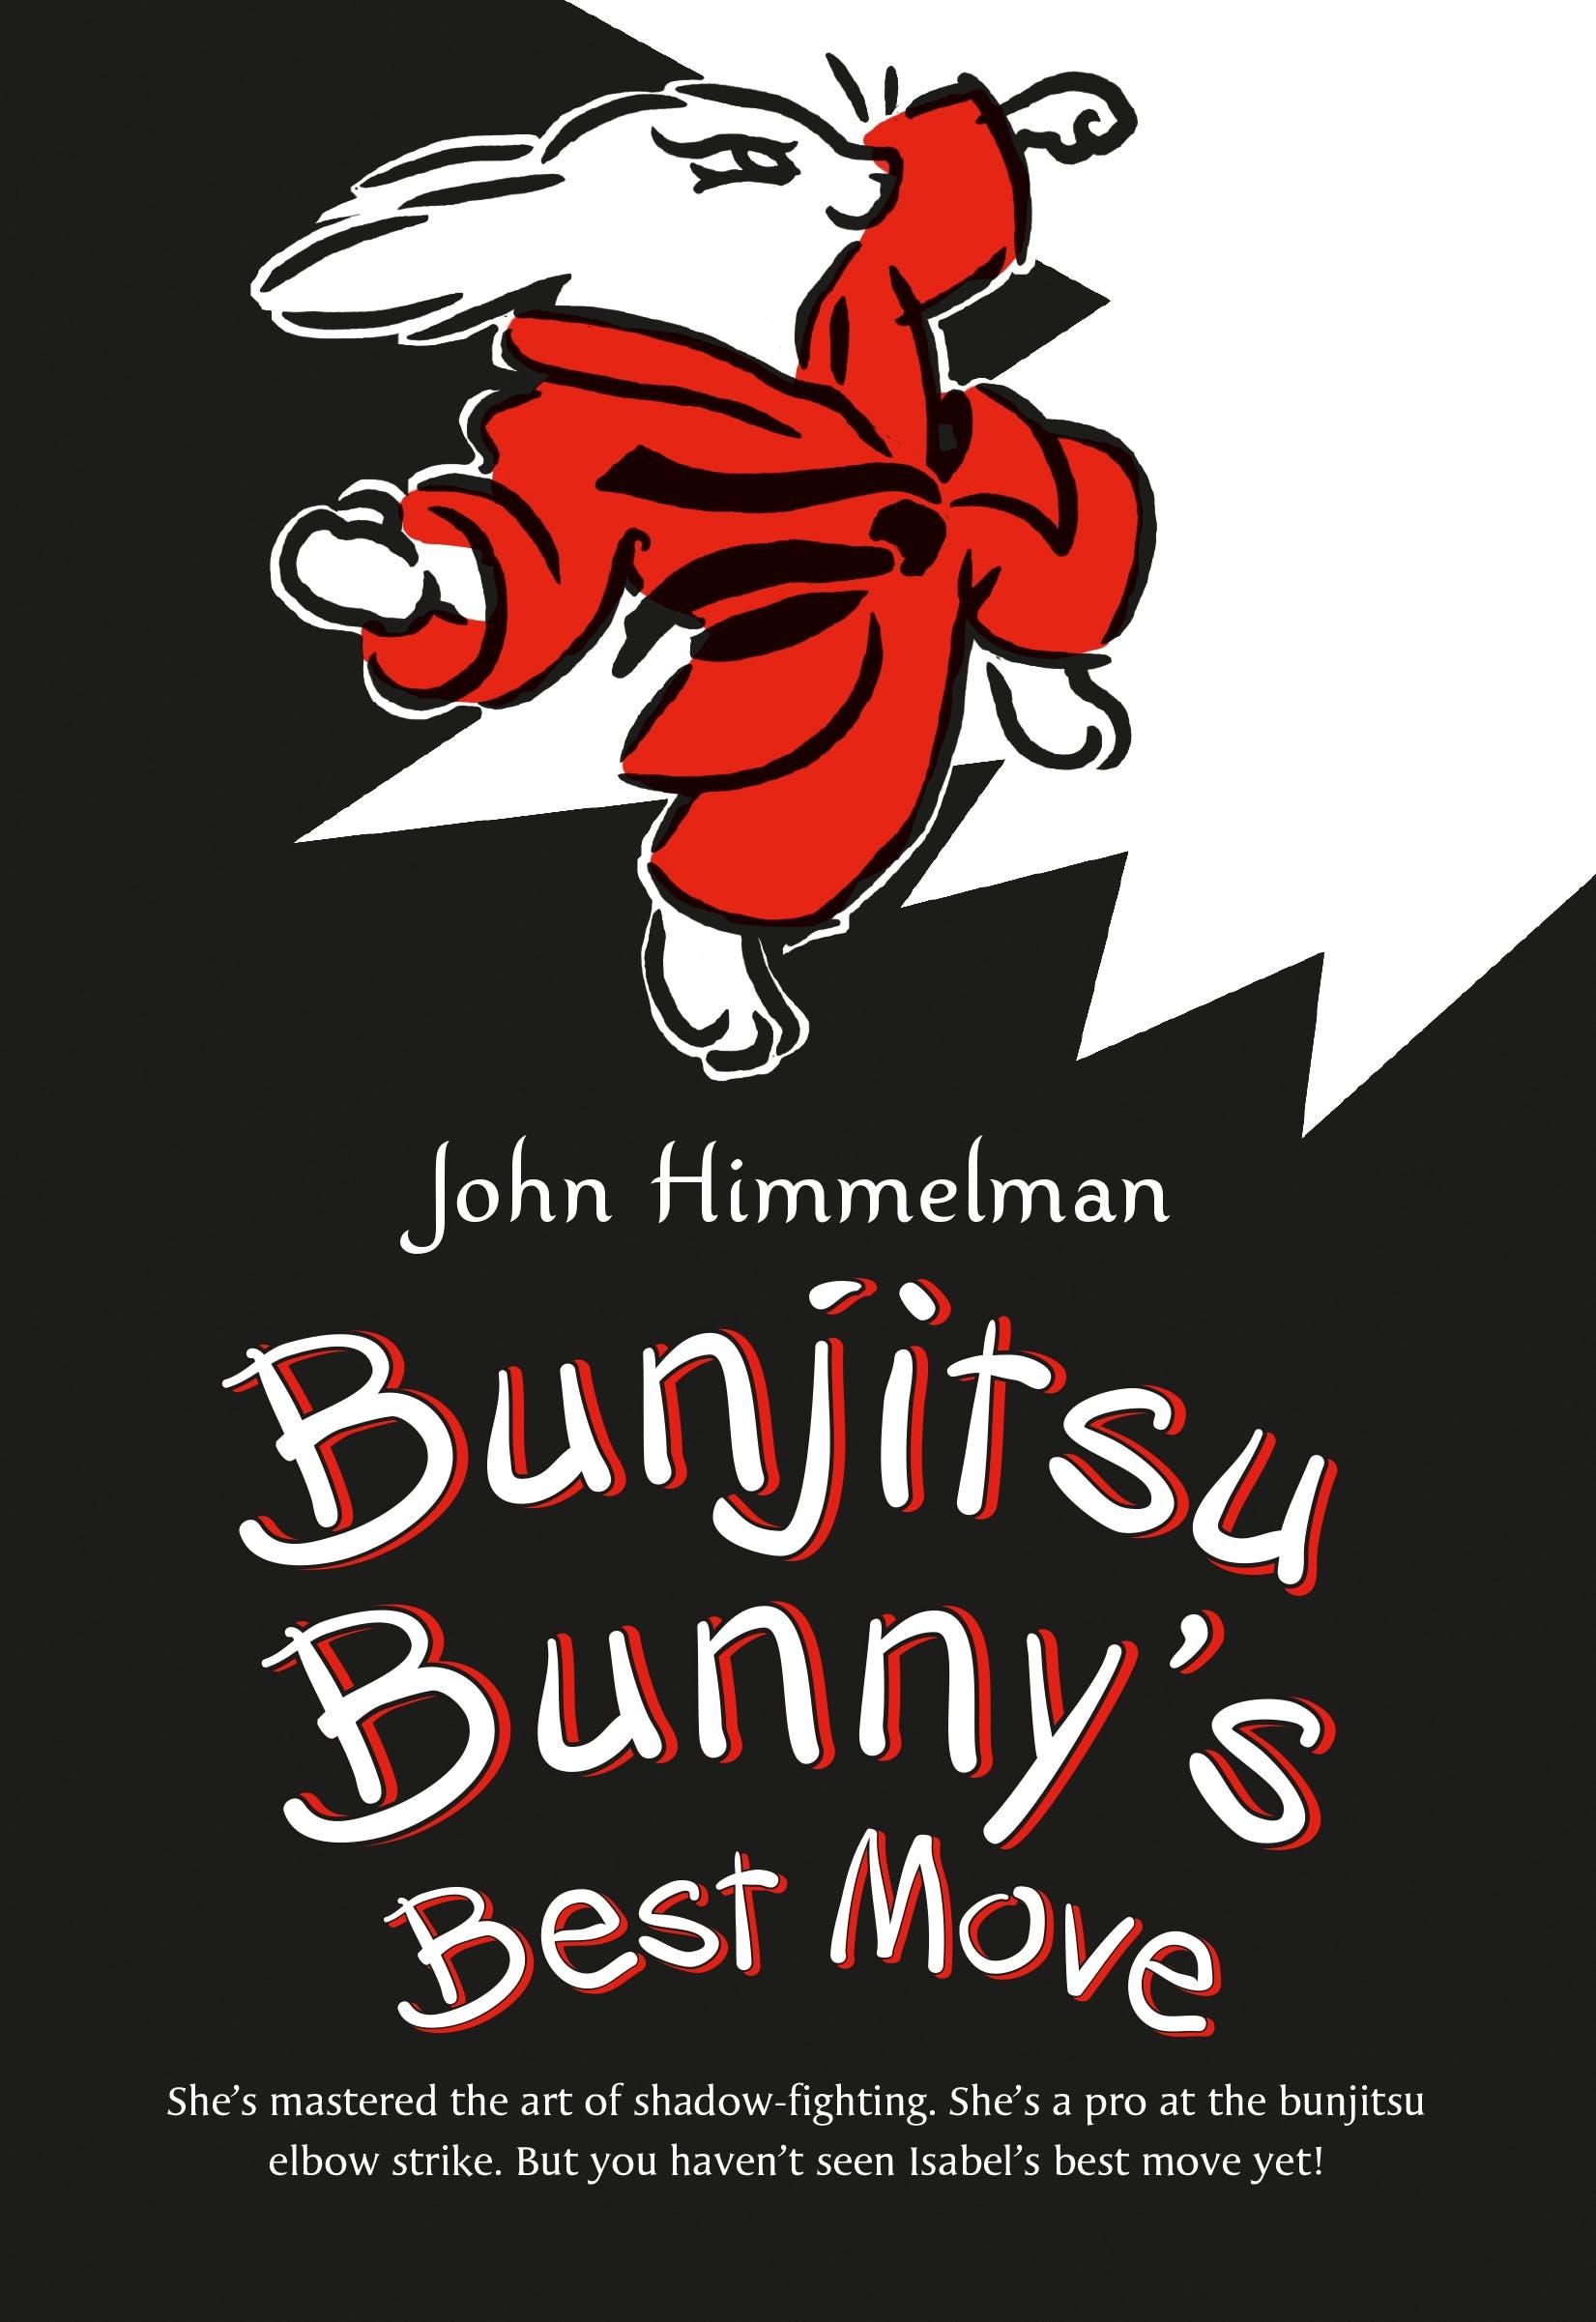 Image of Bunjitsu Bunny's Best Move